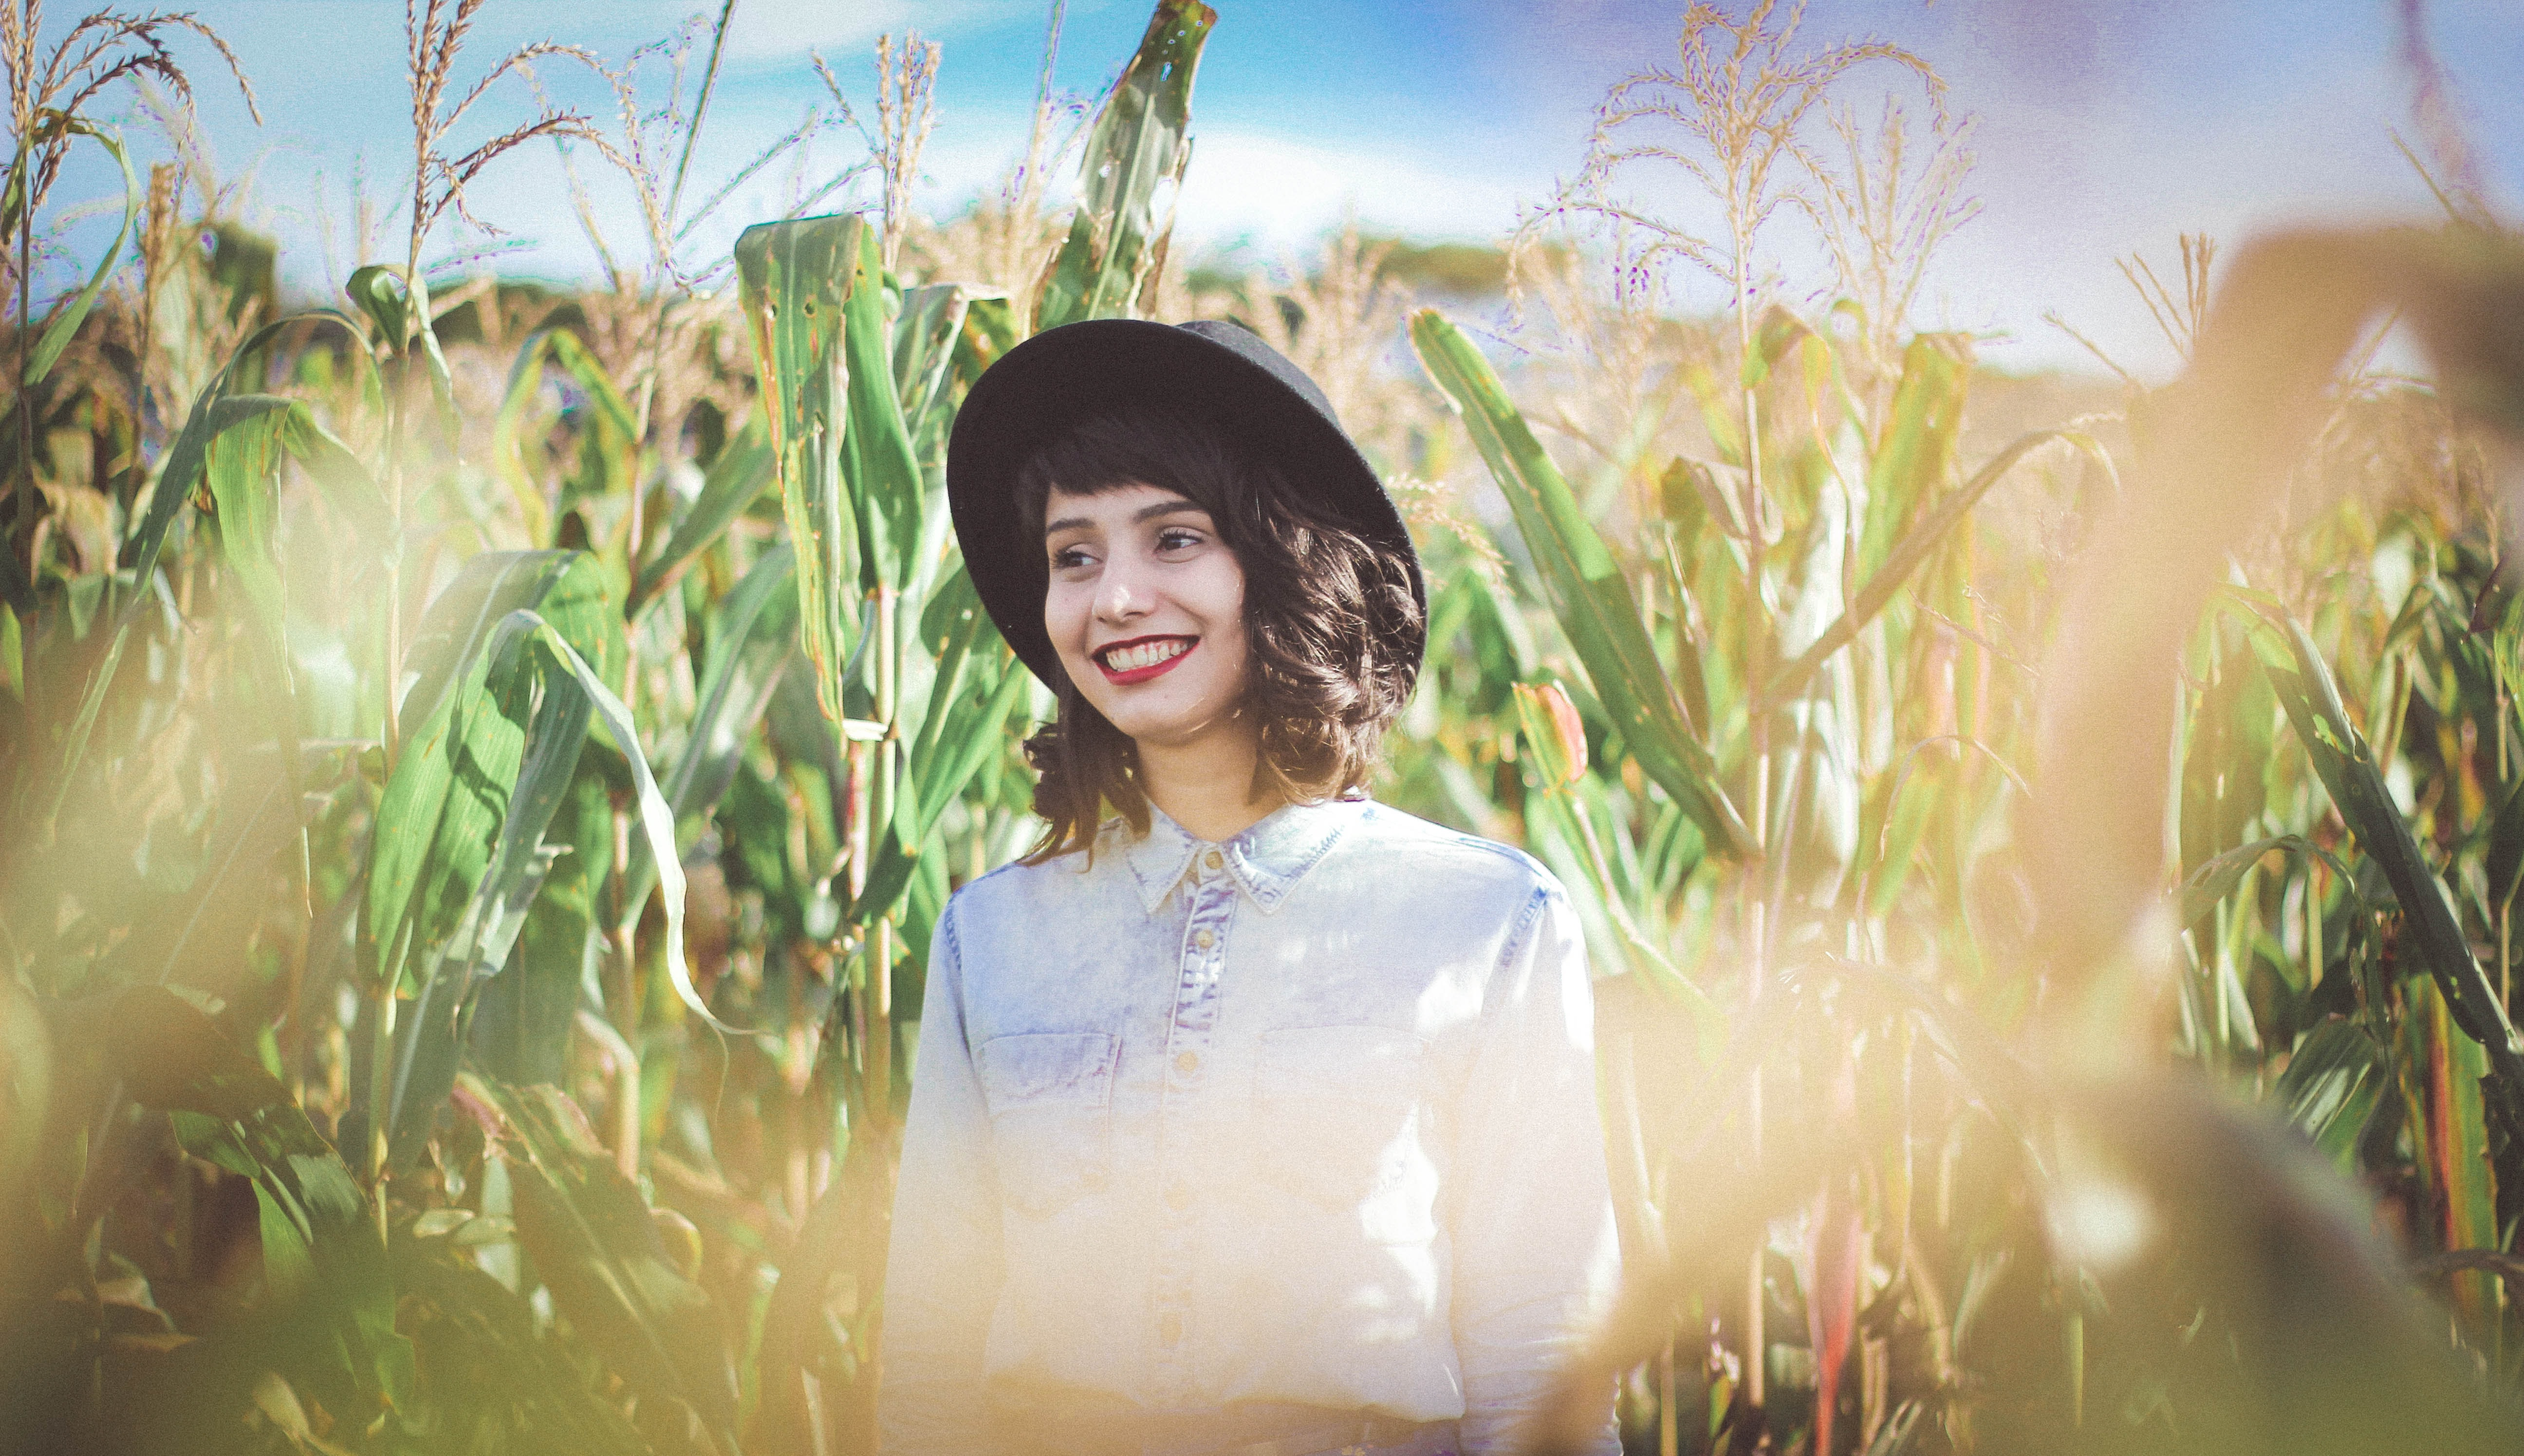 woman in blue denim top standing on cornfield